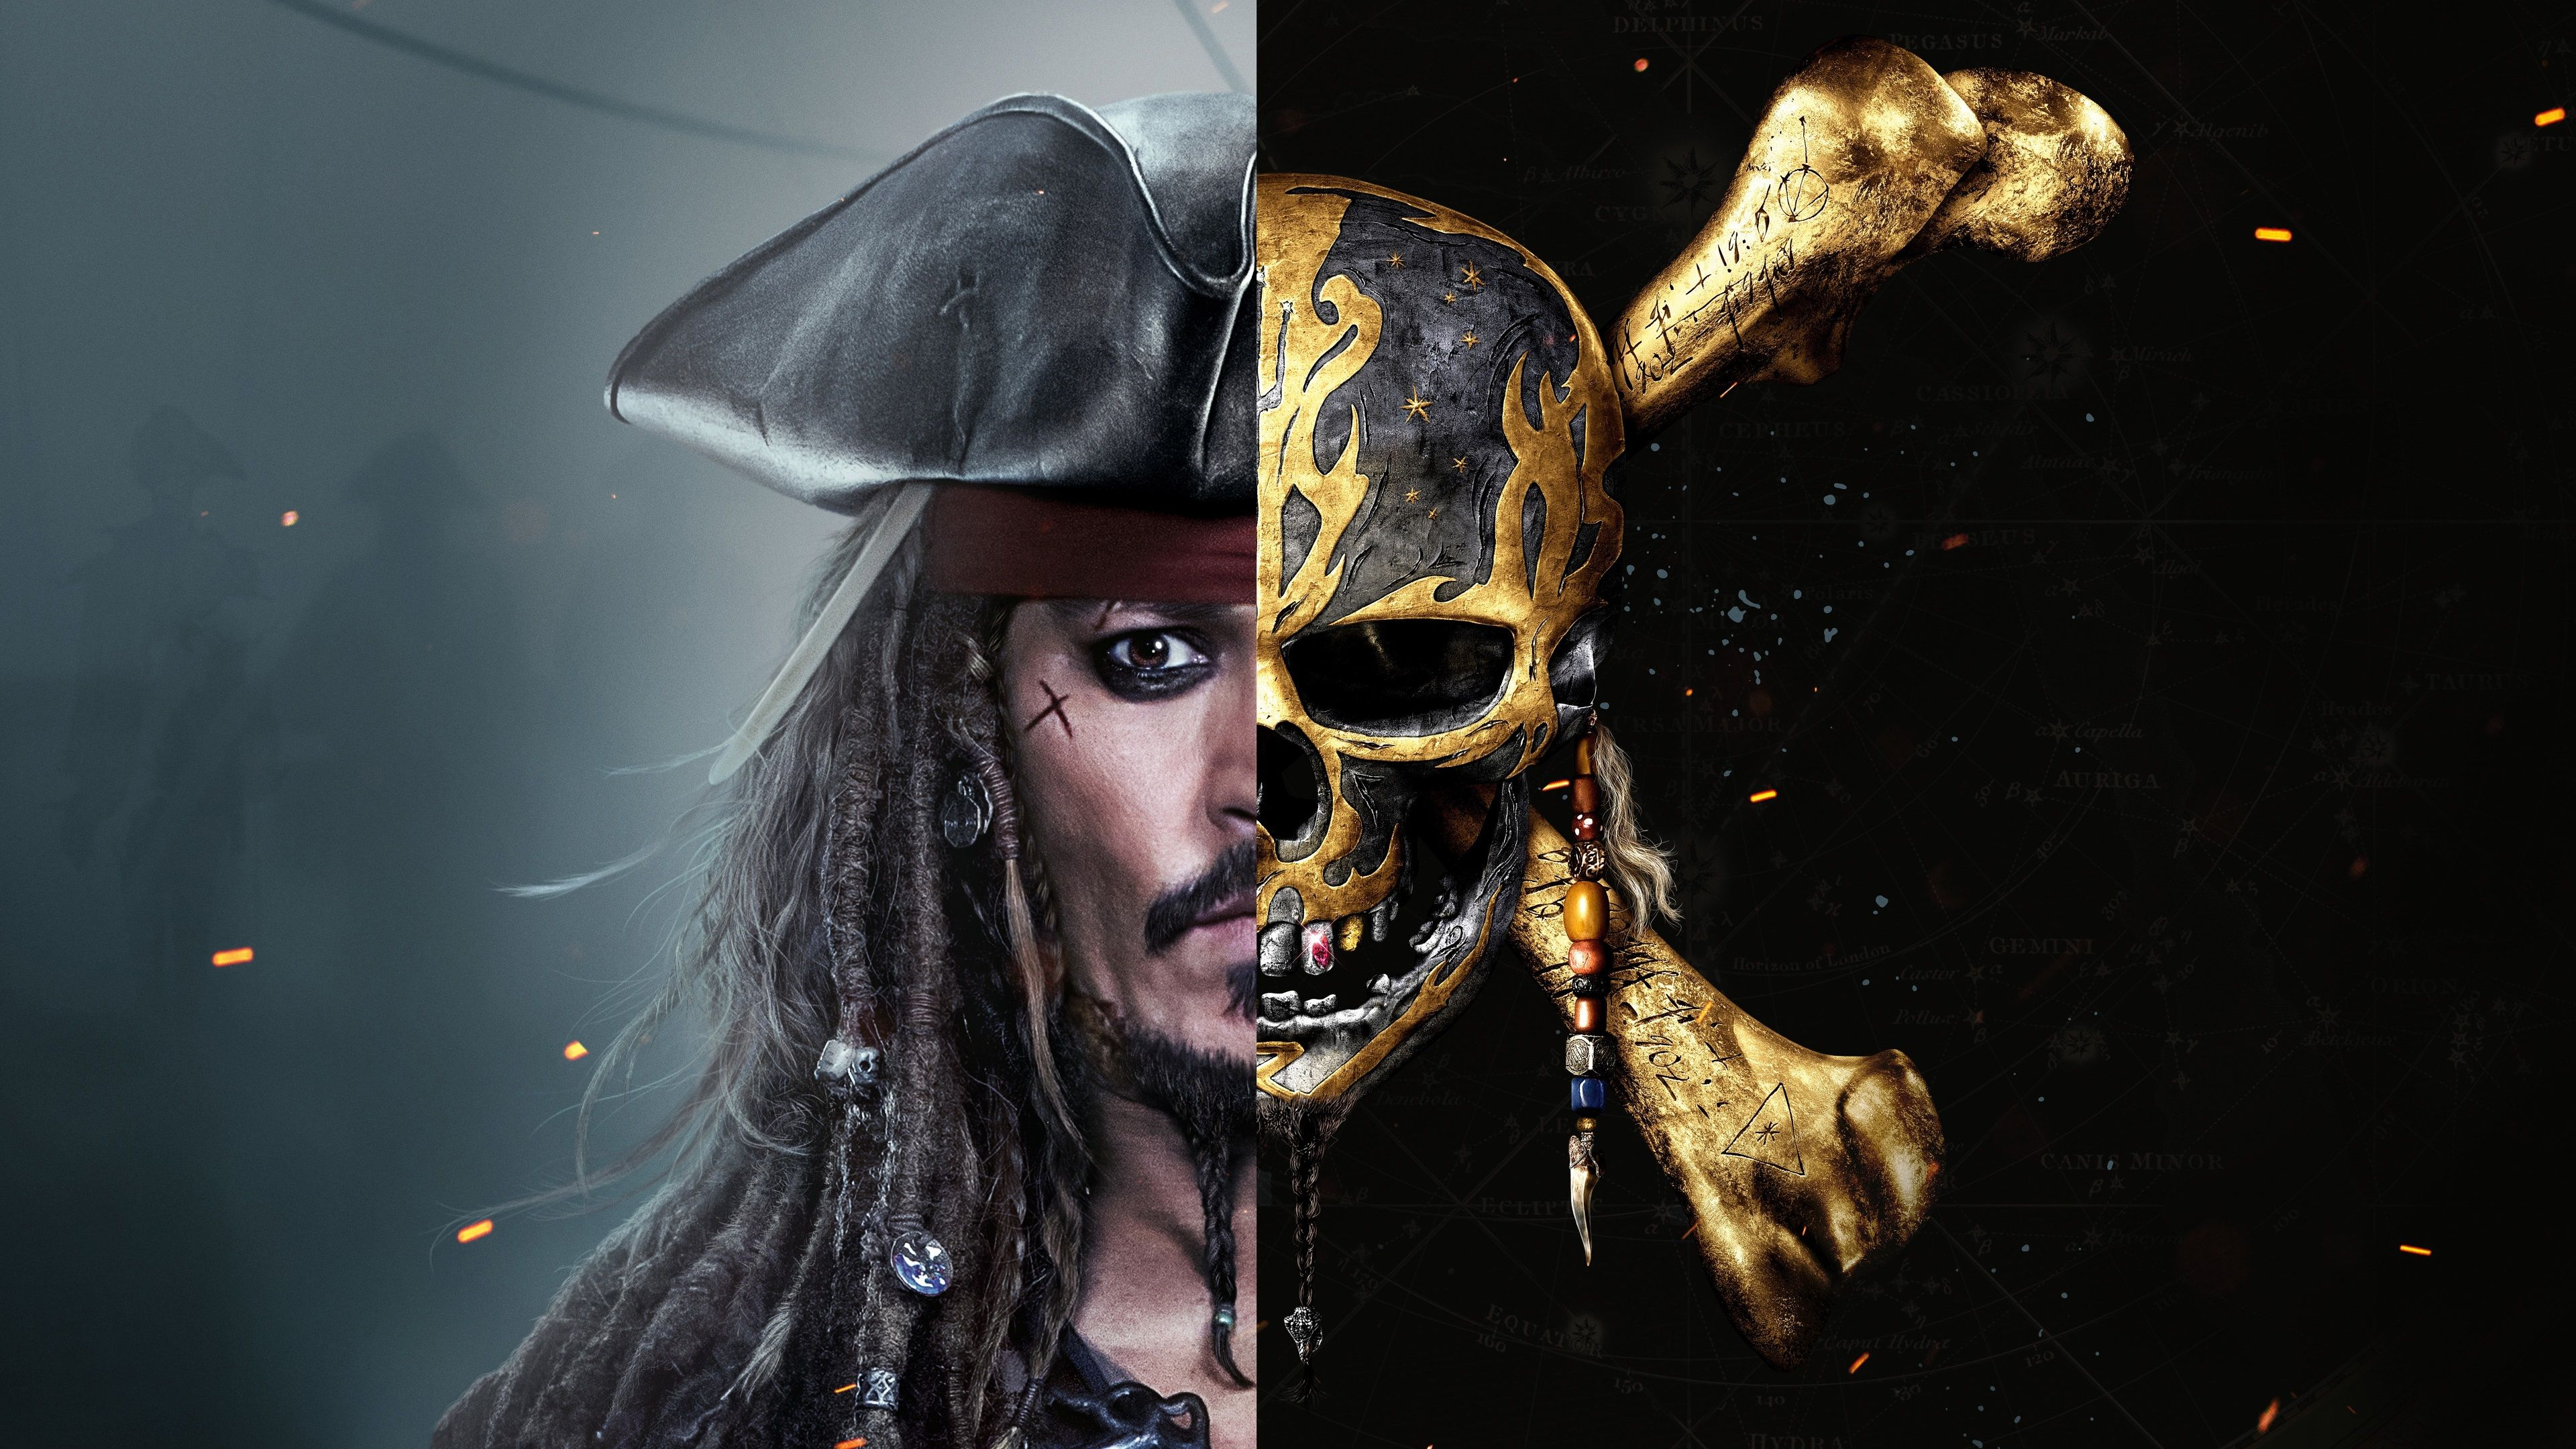 3840x2160 Pirates Of The Caribbean Dead Men Tell No Tales 4k